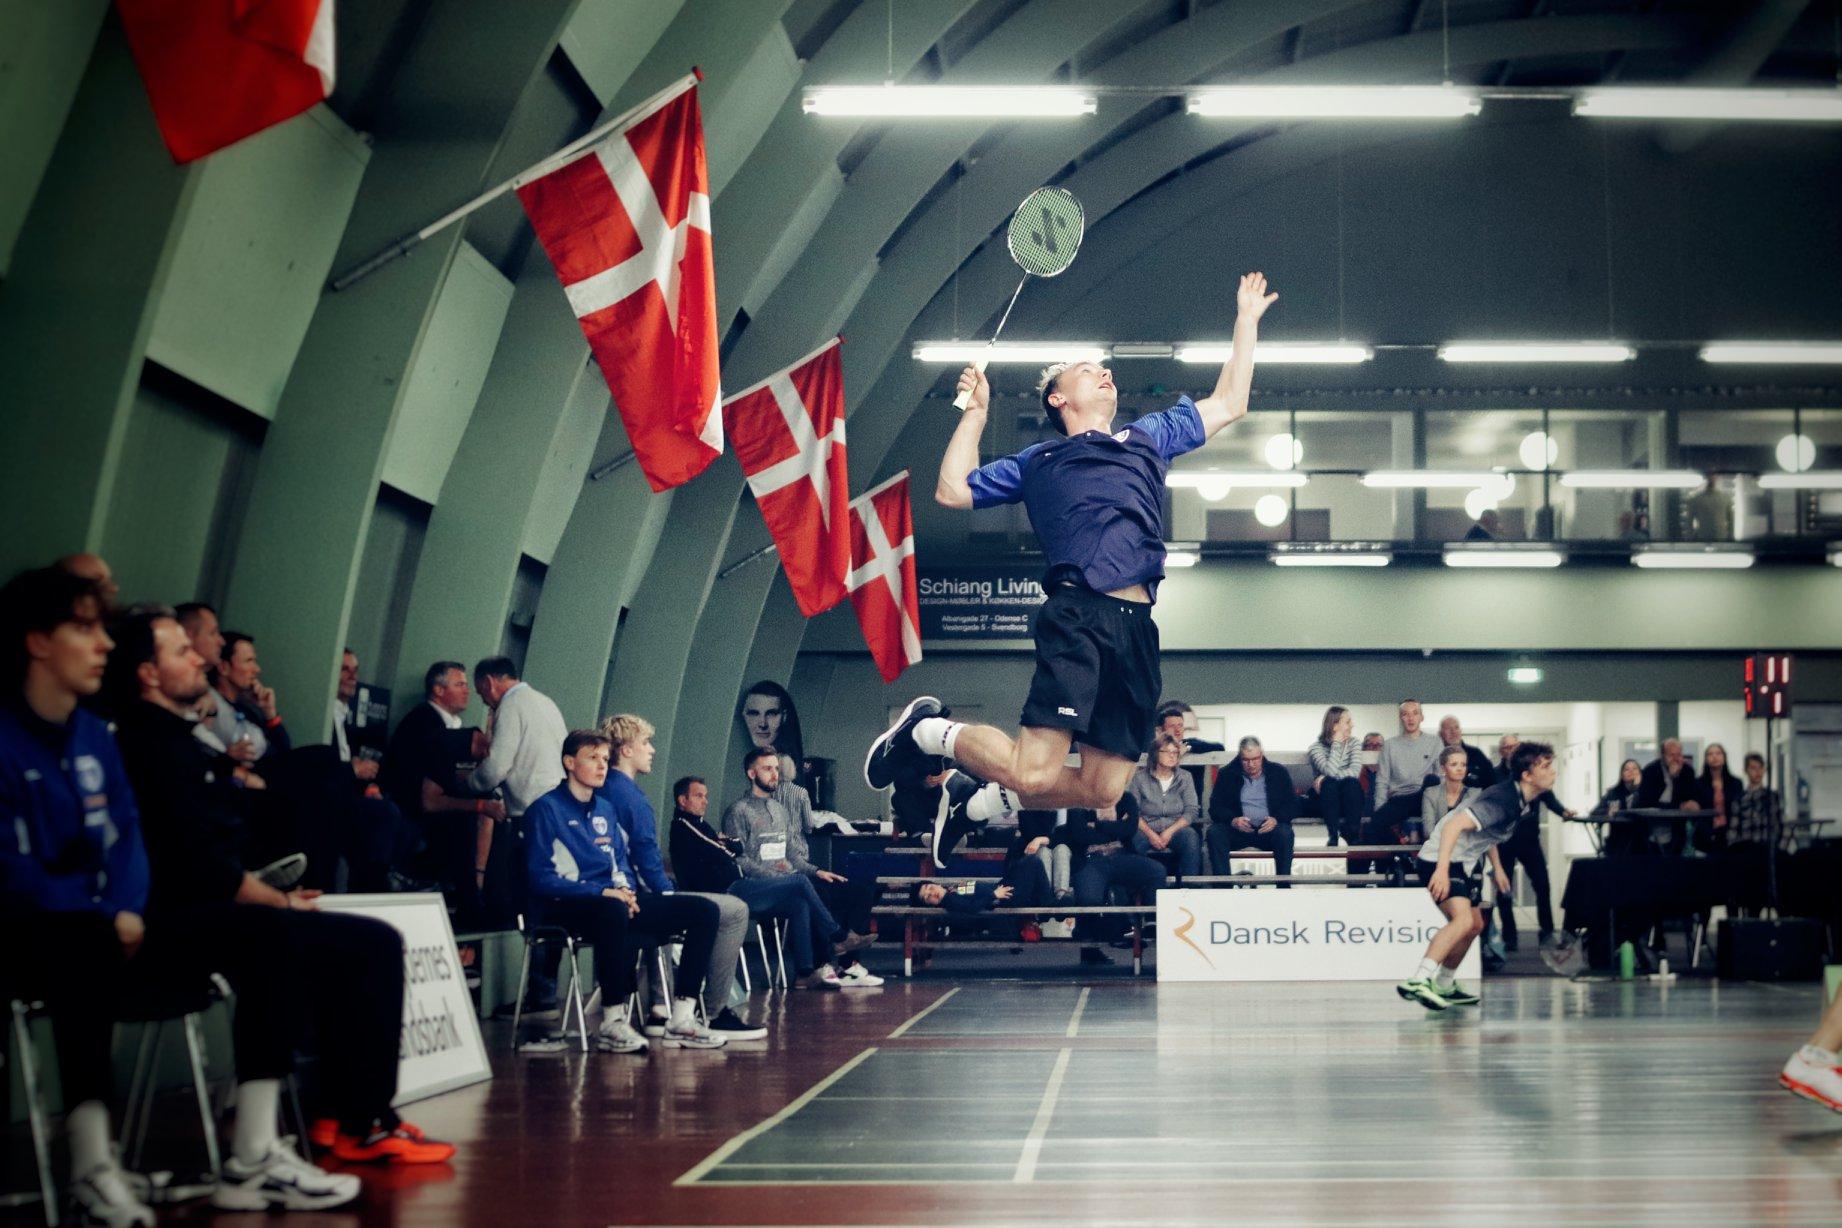 Begrænset antal tilskuere til kampen mellem RSL Odense OBK – TSS